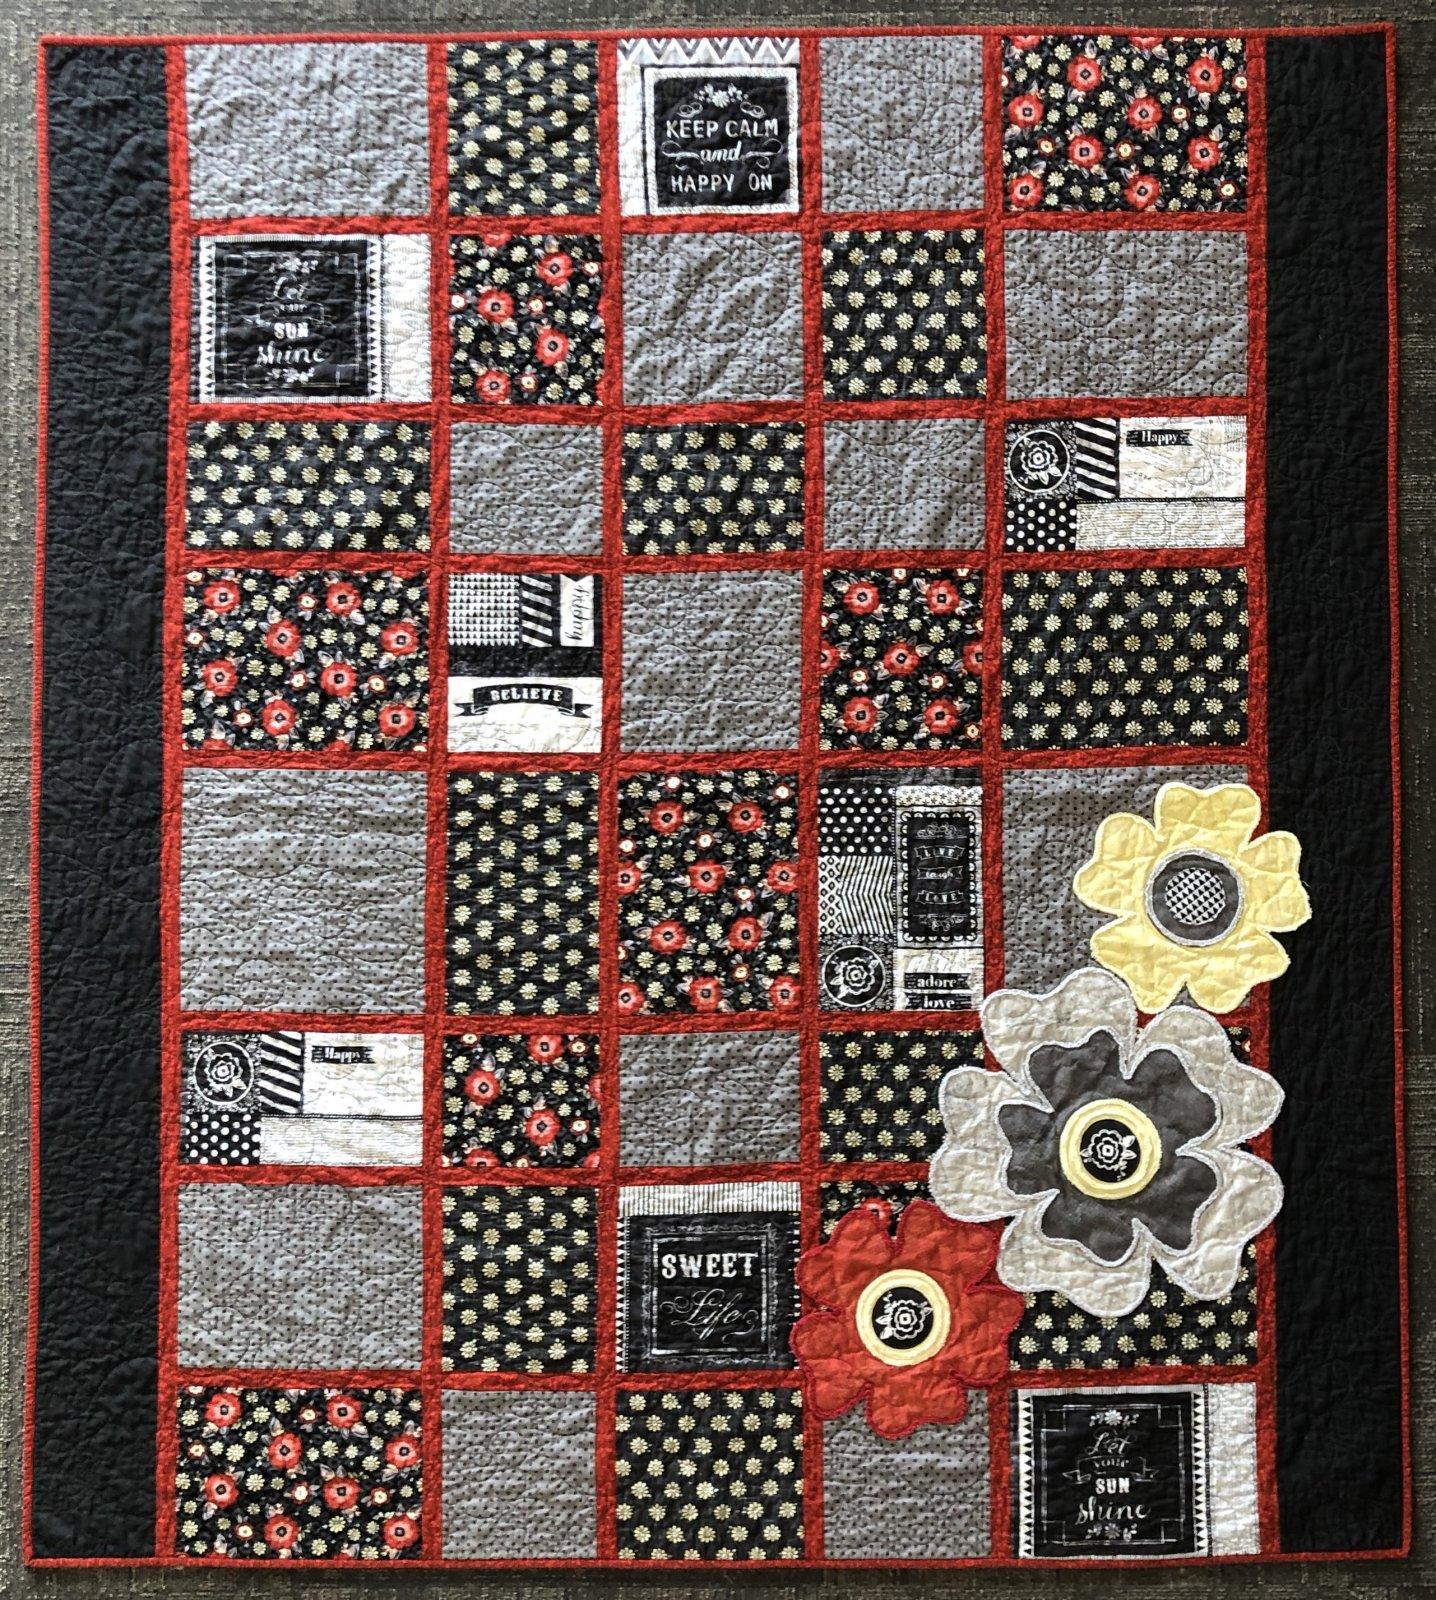 Adornit You & Me Chalk Chatter Quilt Kit 62 x 70